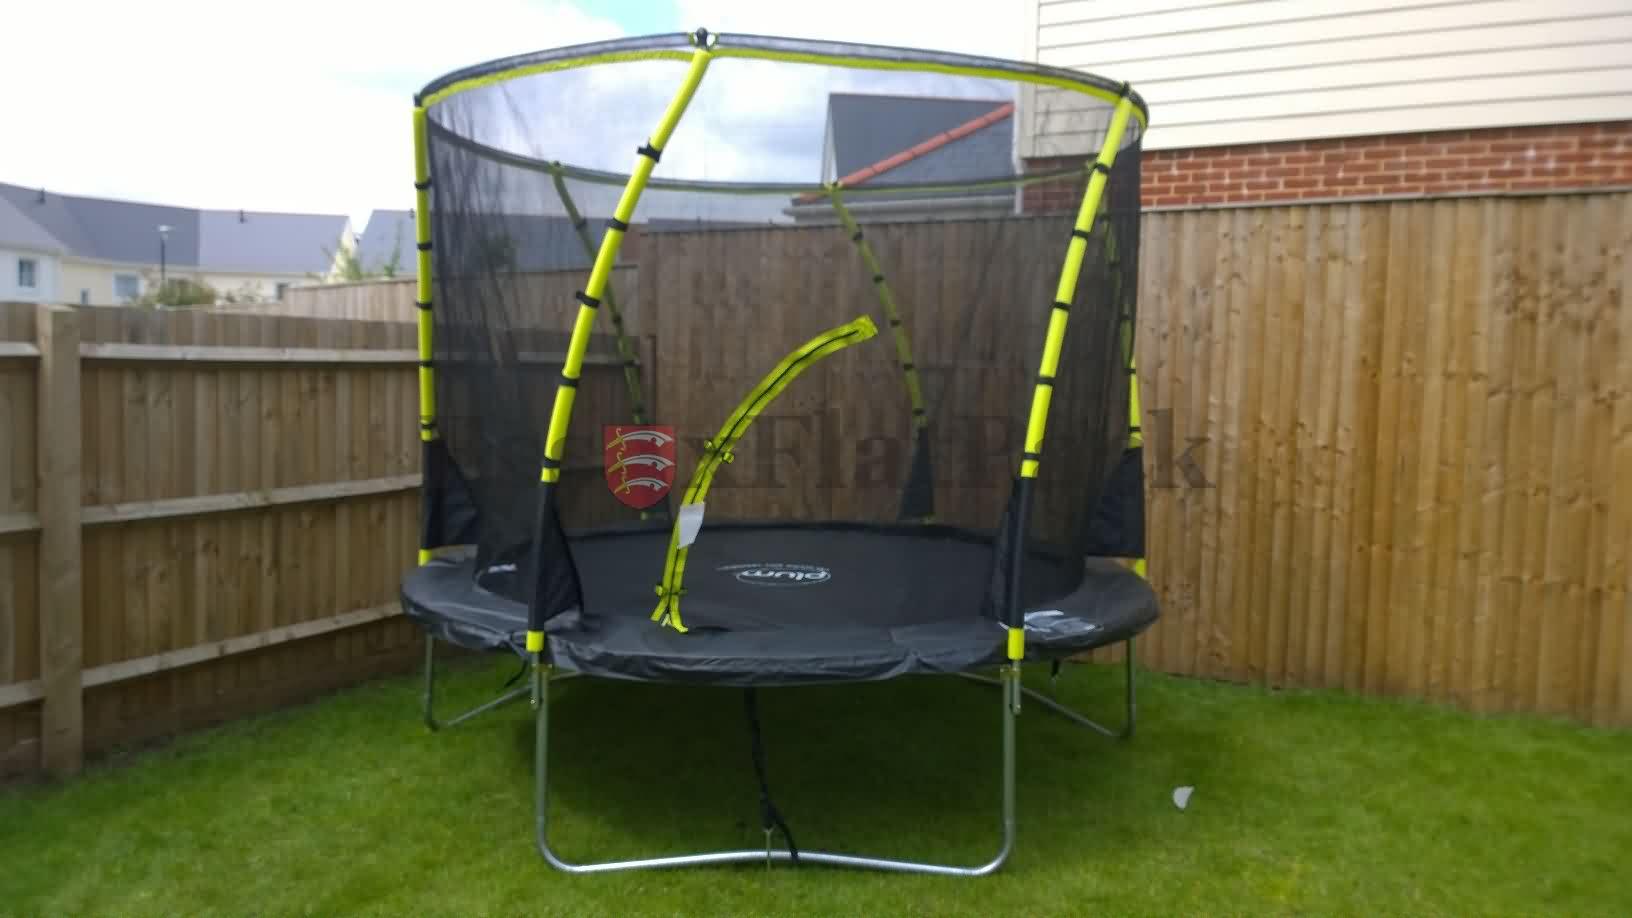 essexflatpack-trampolines-20160526112542.jpg